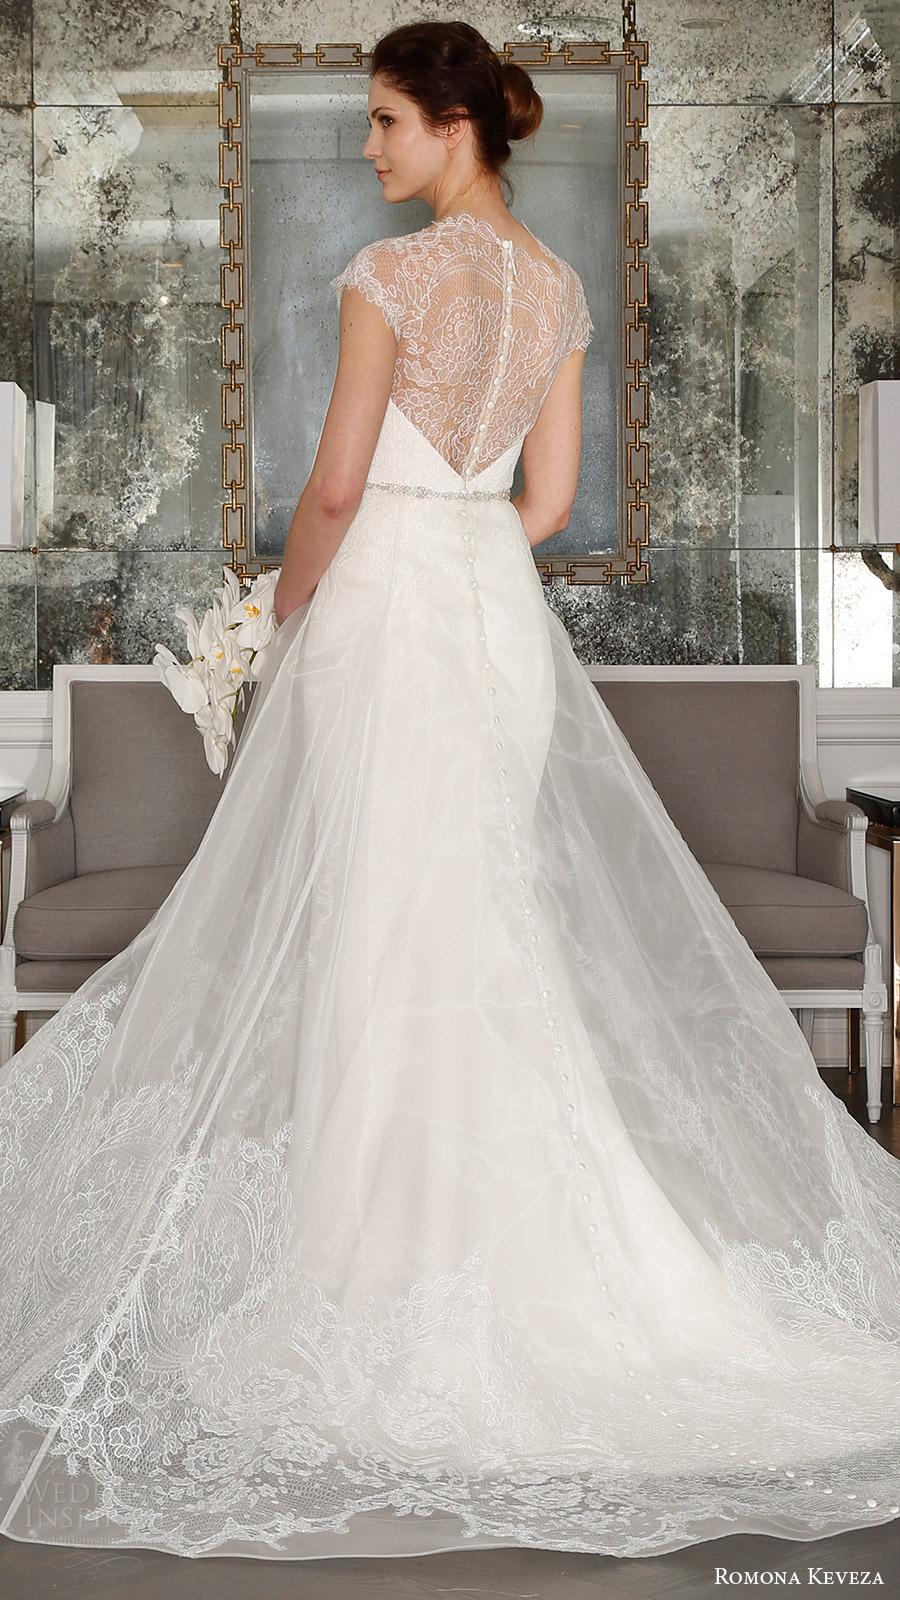 romona keveza bridal spring 2017 cap sleeves sweetheart illusion high neck sheath wedding dress (rk7404) bv optional sheer aline overskirt